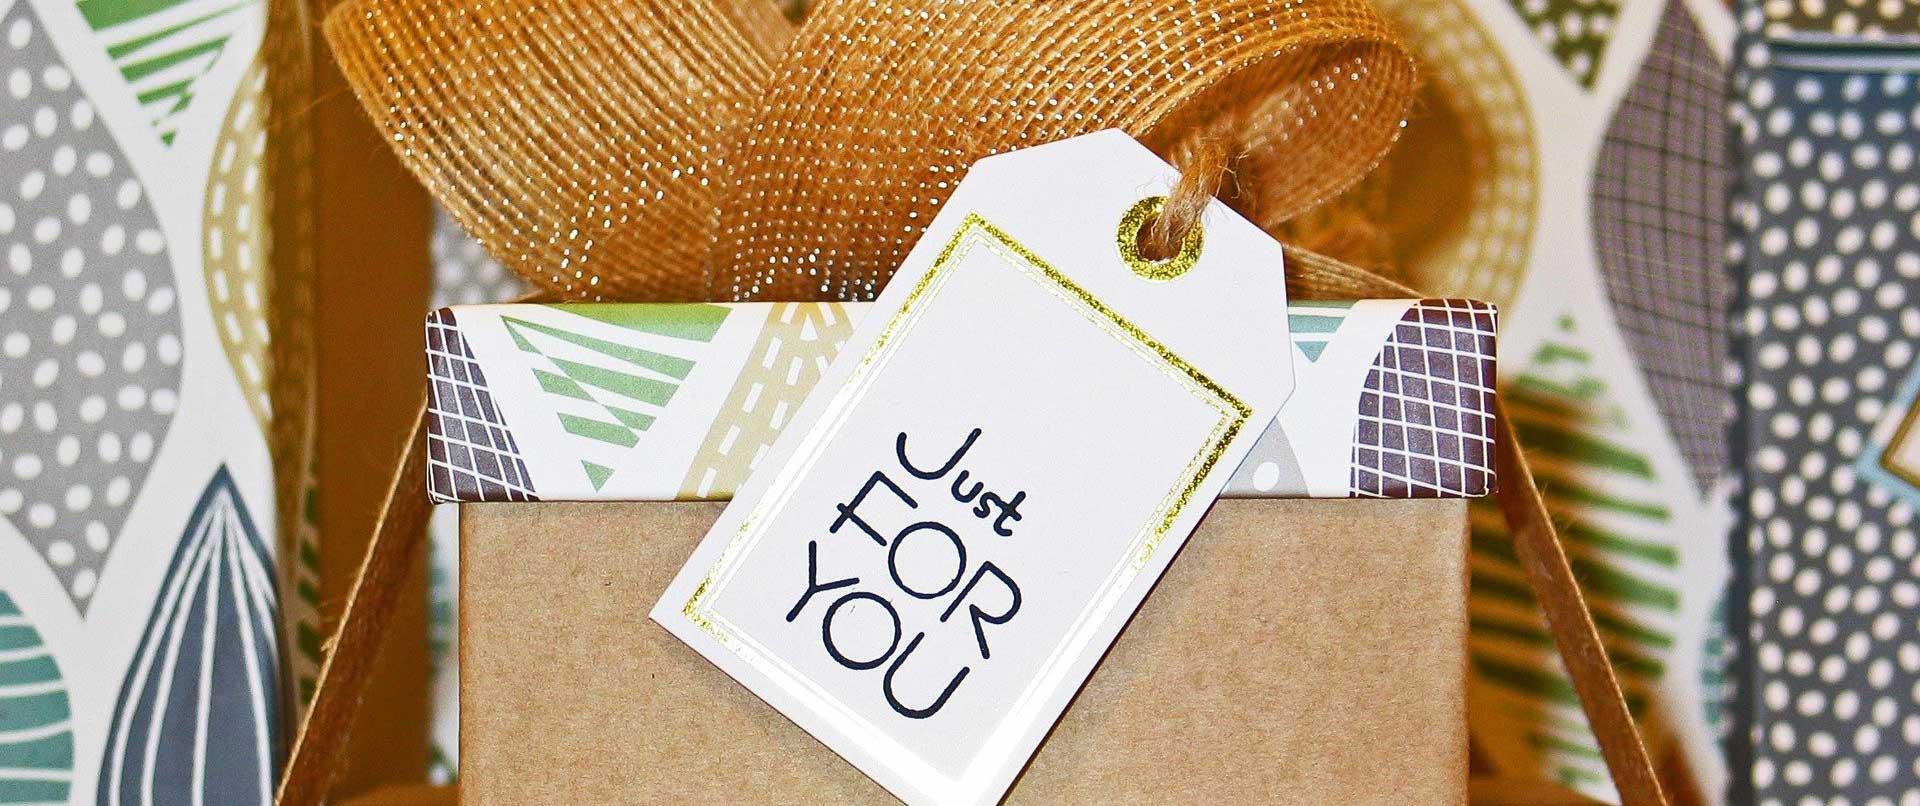 GREEN QUEEN חנות מתנות לאישה: מתנות מיוחדות לאישה